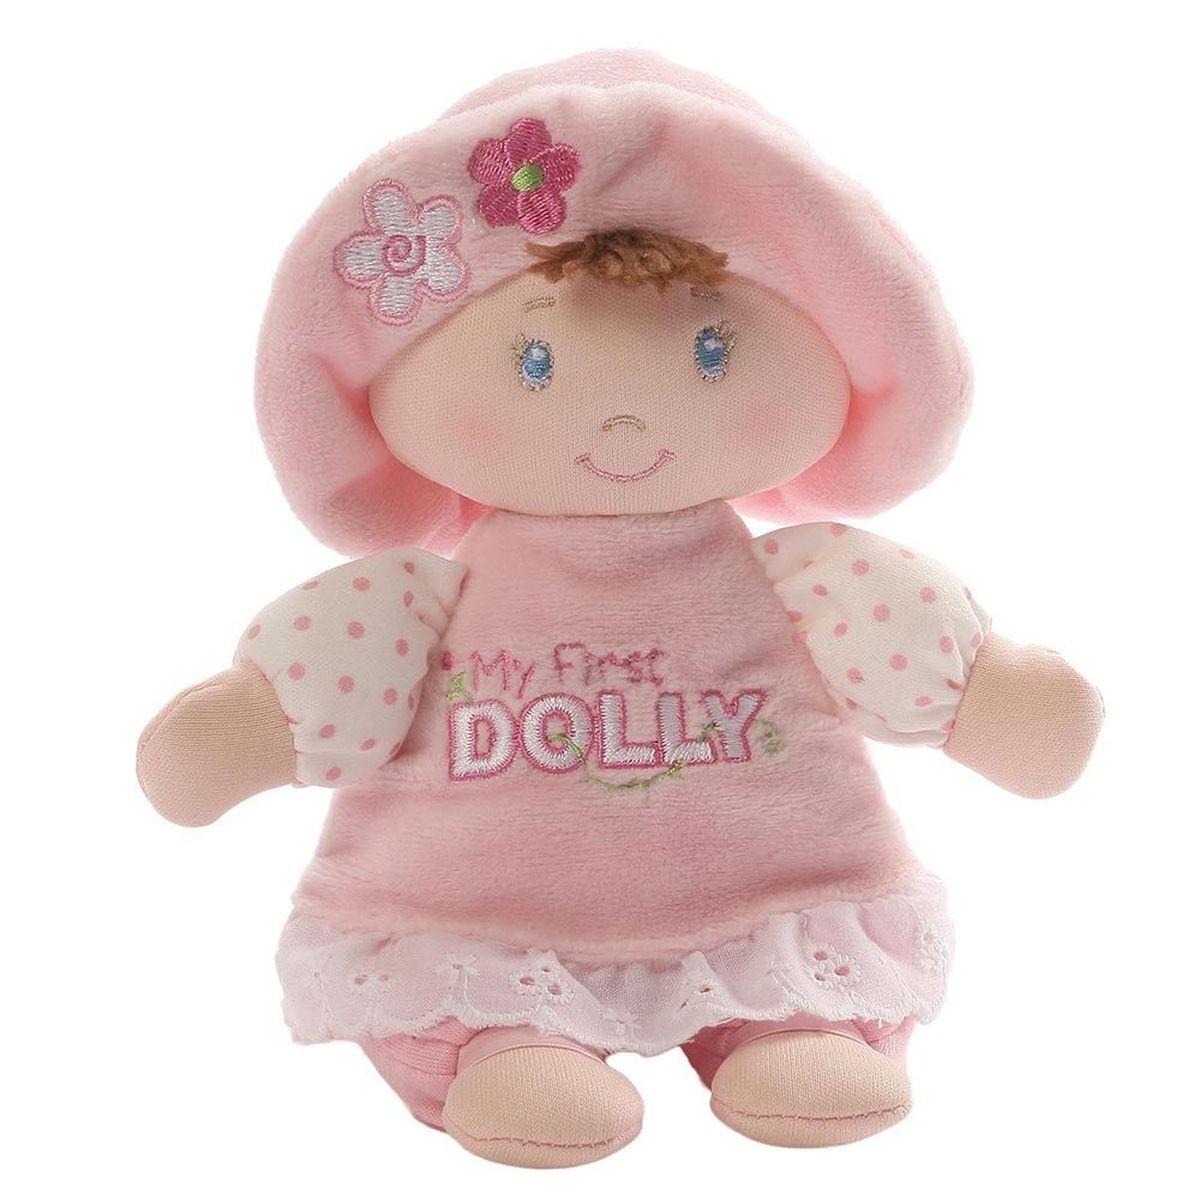 Gund Мягкая игрушка My First Dolly Small Brunette Rattle 18 см gund мягкая игрушка arlo bear 18 см